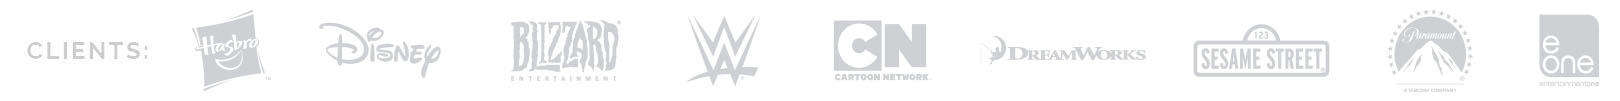 logos 003.jpg